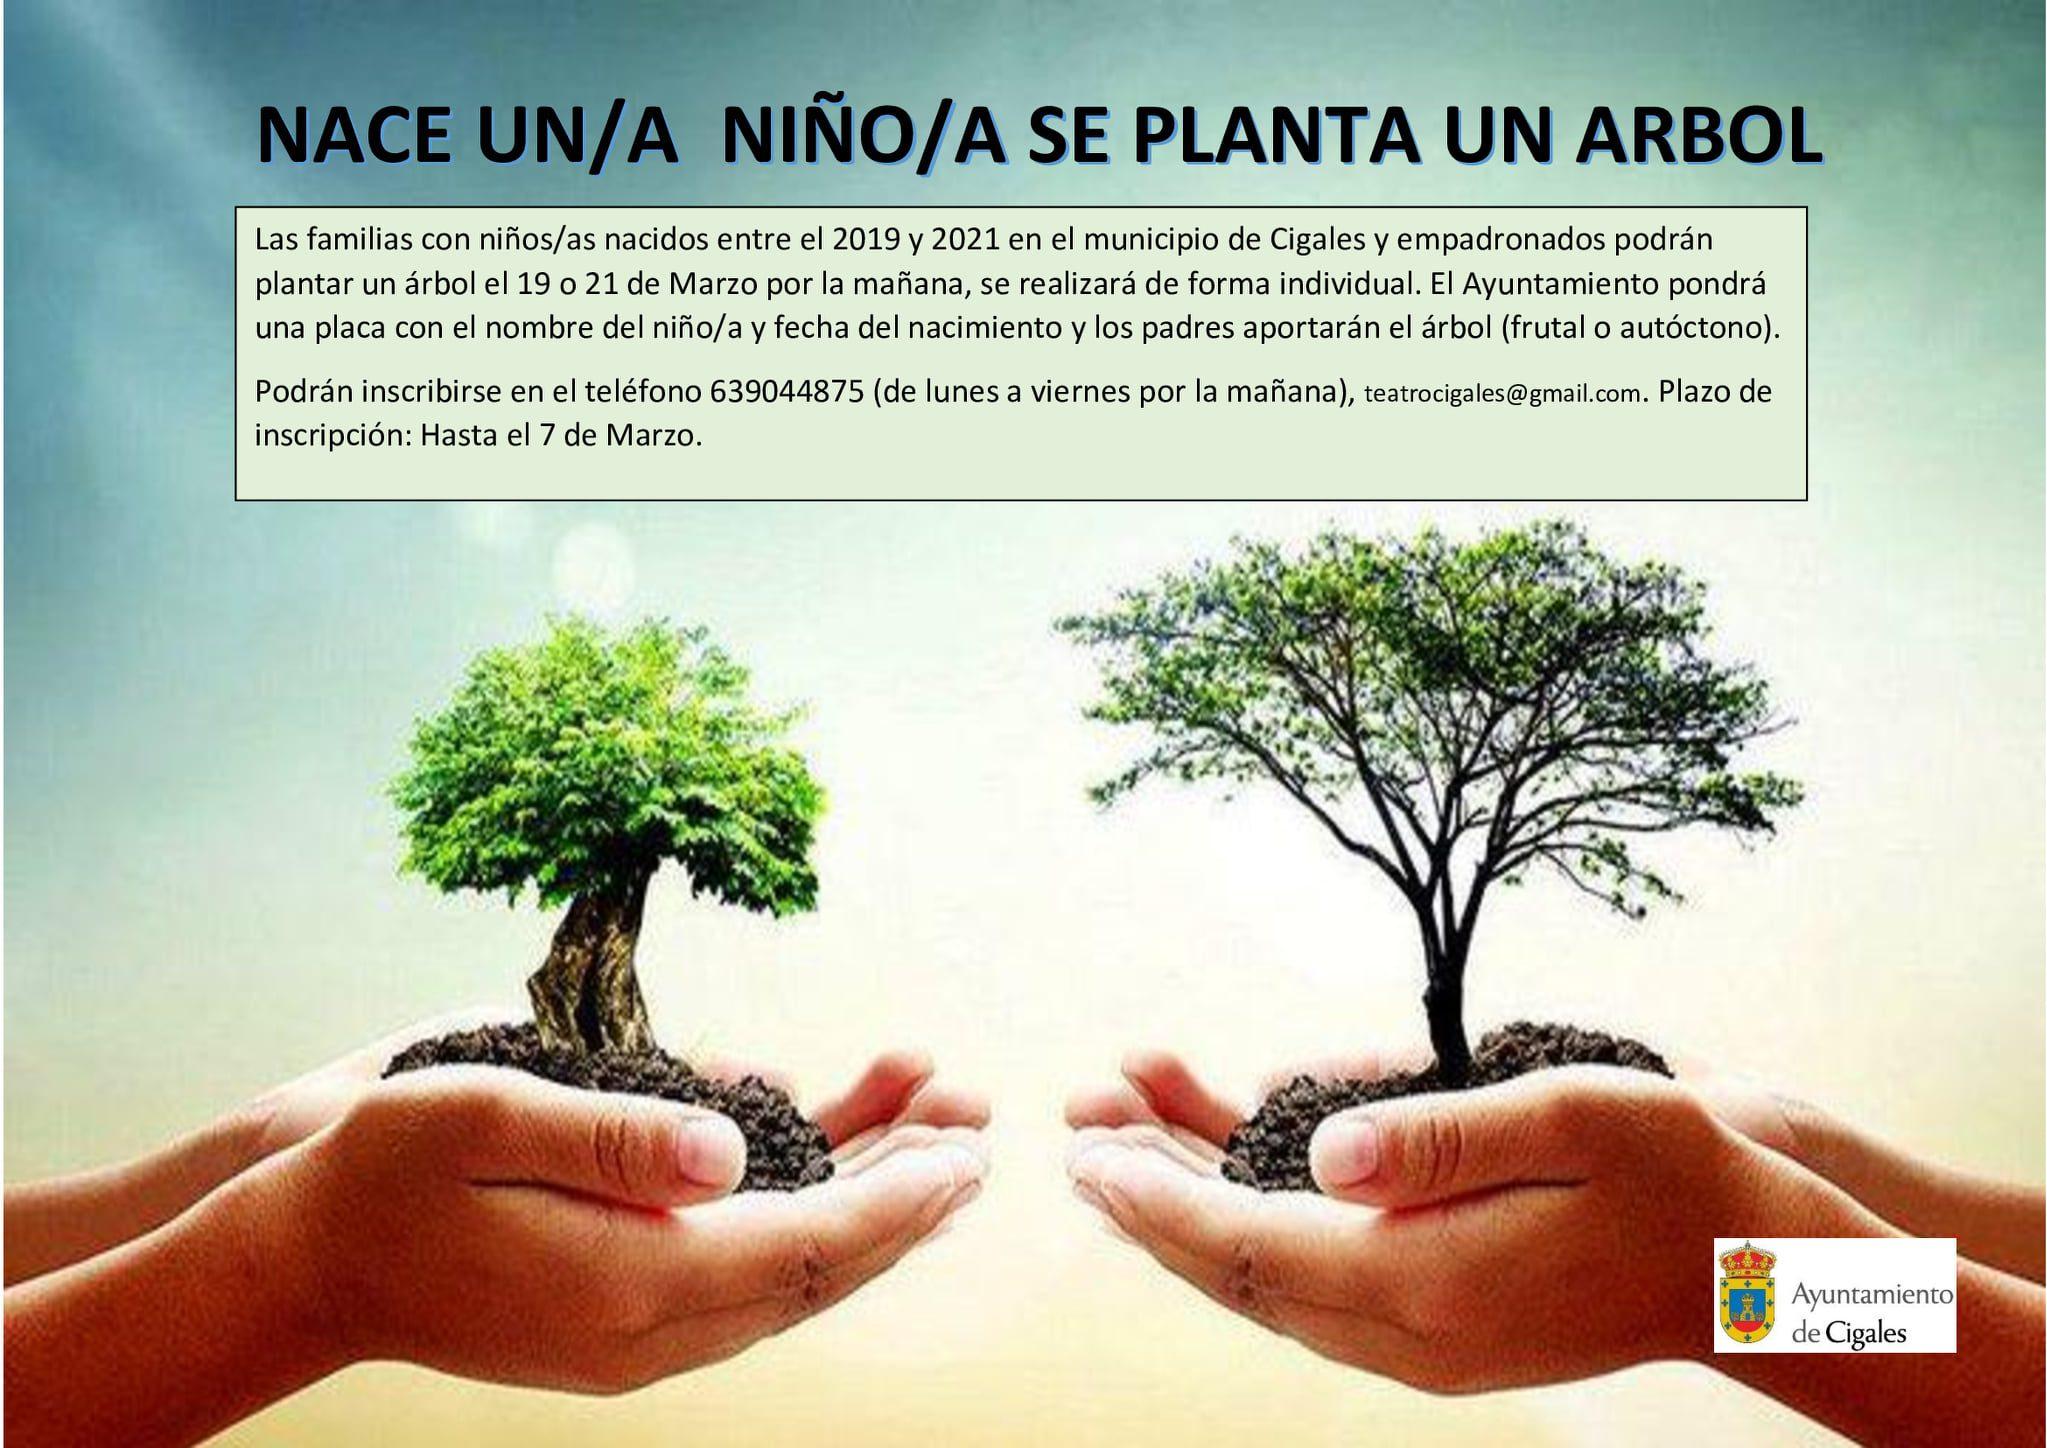 Nace un niño, planta un árbol